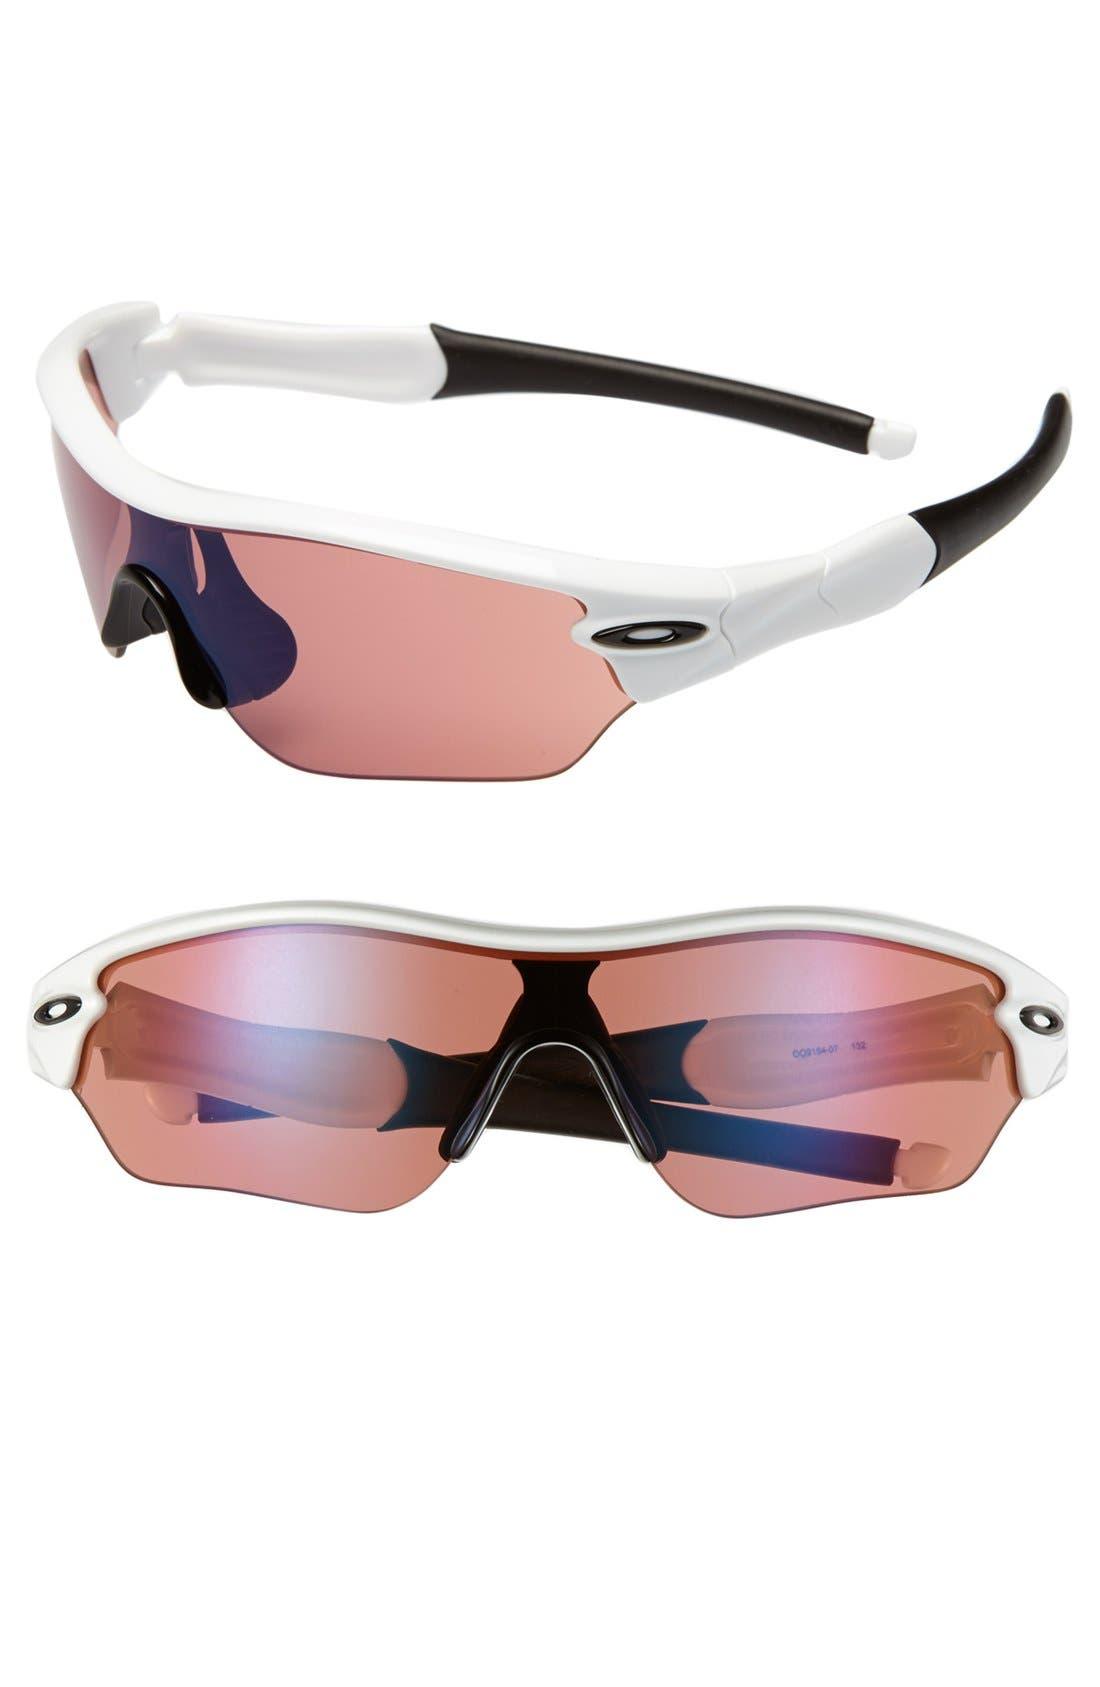 Main Image - Oakley 'Radar® Edge™' 135mm Sunglasses